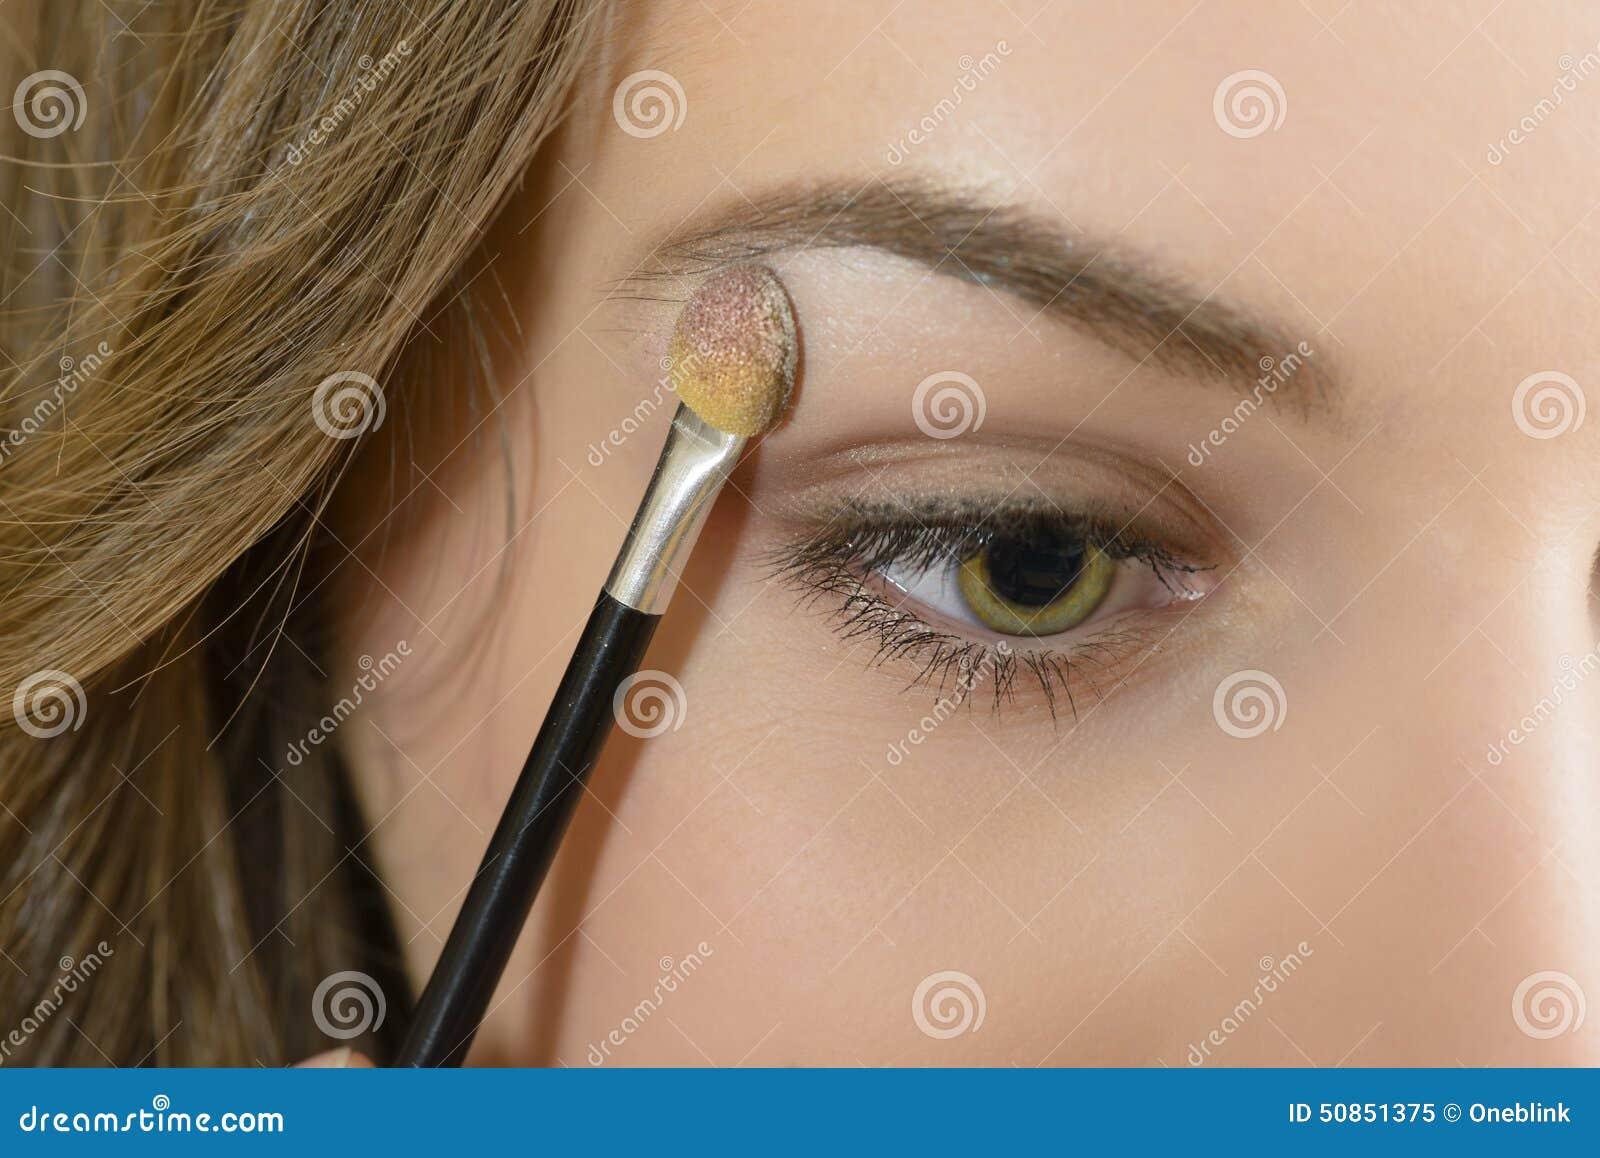 Applying Eyeshadow Stock Image Image Of Face Aging